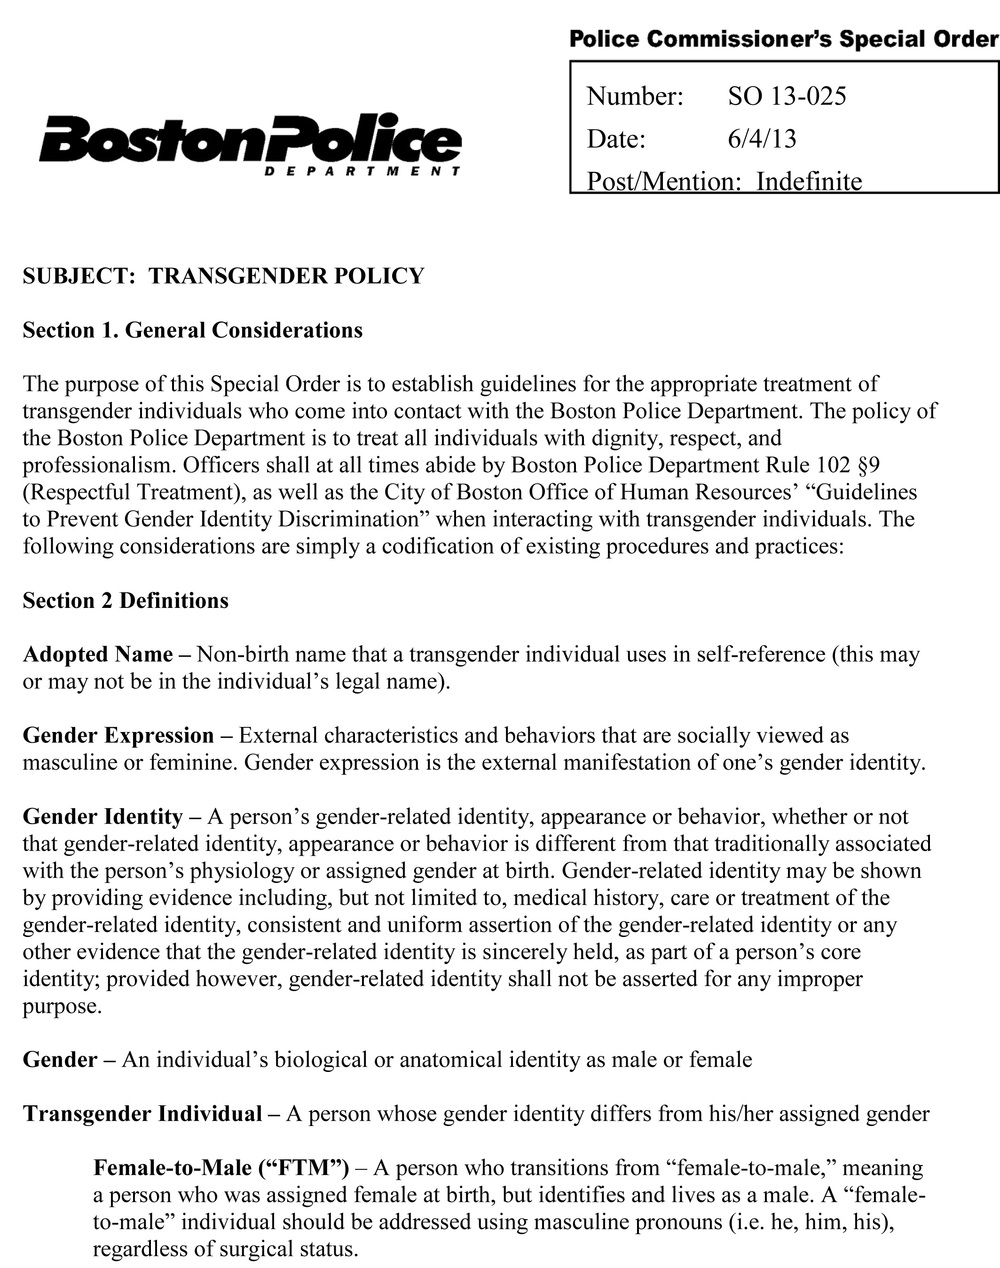 Police Commissioner's Special Order-1.jpg